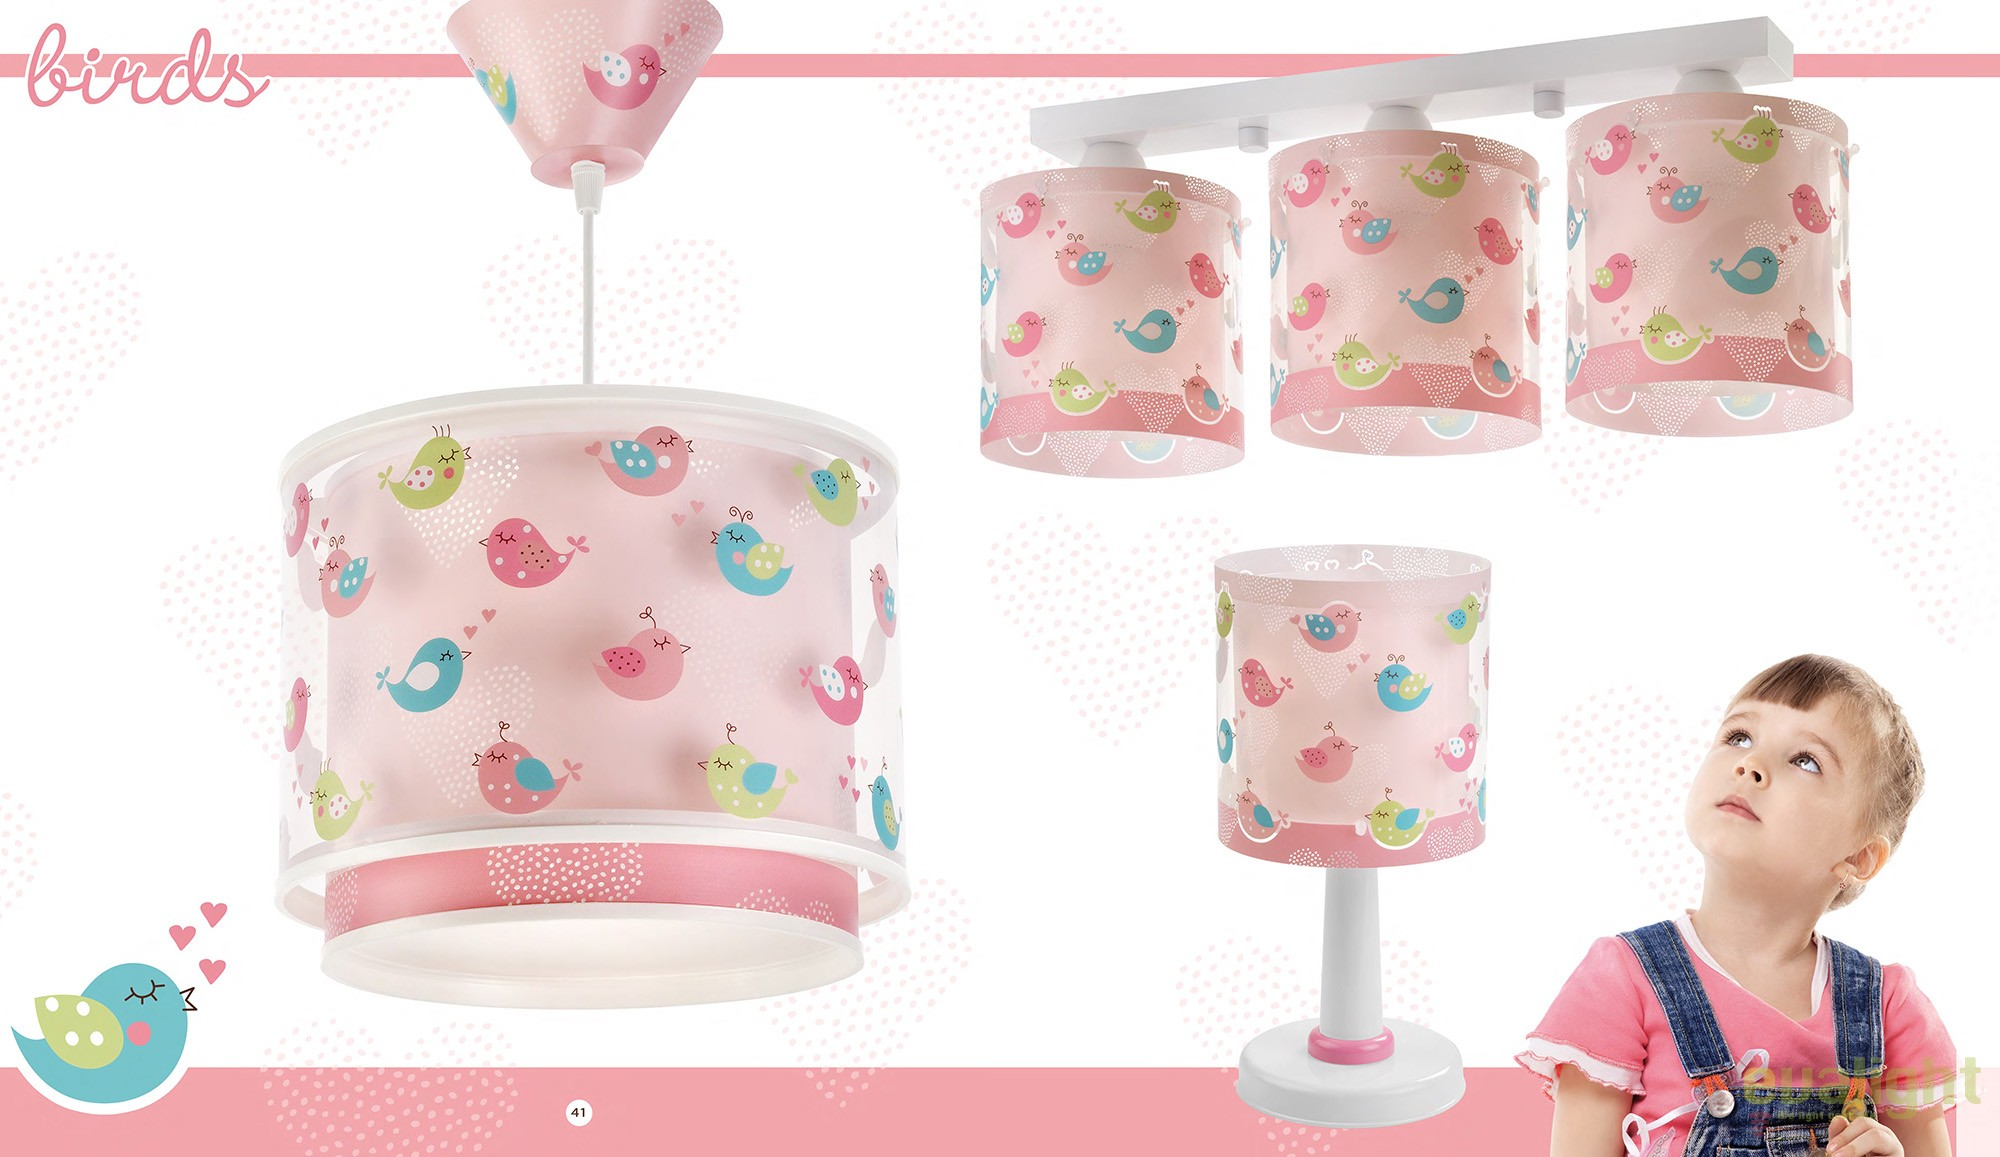 lustra camera copii roz cu pasari imprimate birds 60292 db corpuri de iluminat lustre aplice. Black Bedroom Furniture Sets. Home Design Ideas